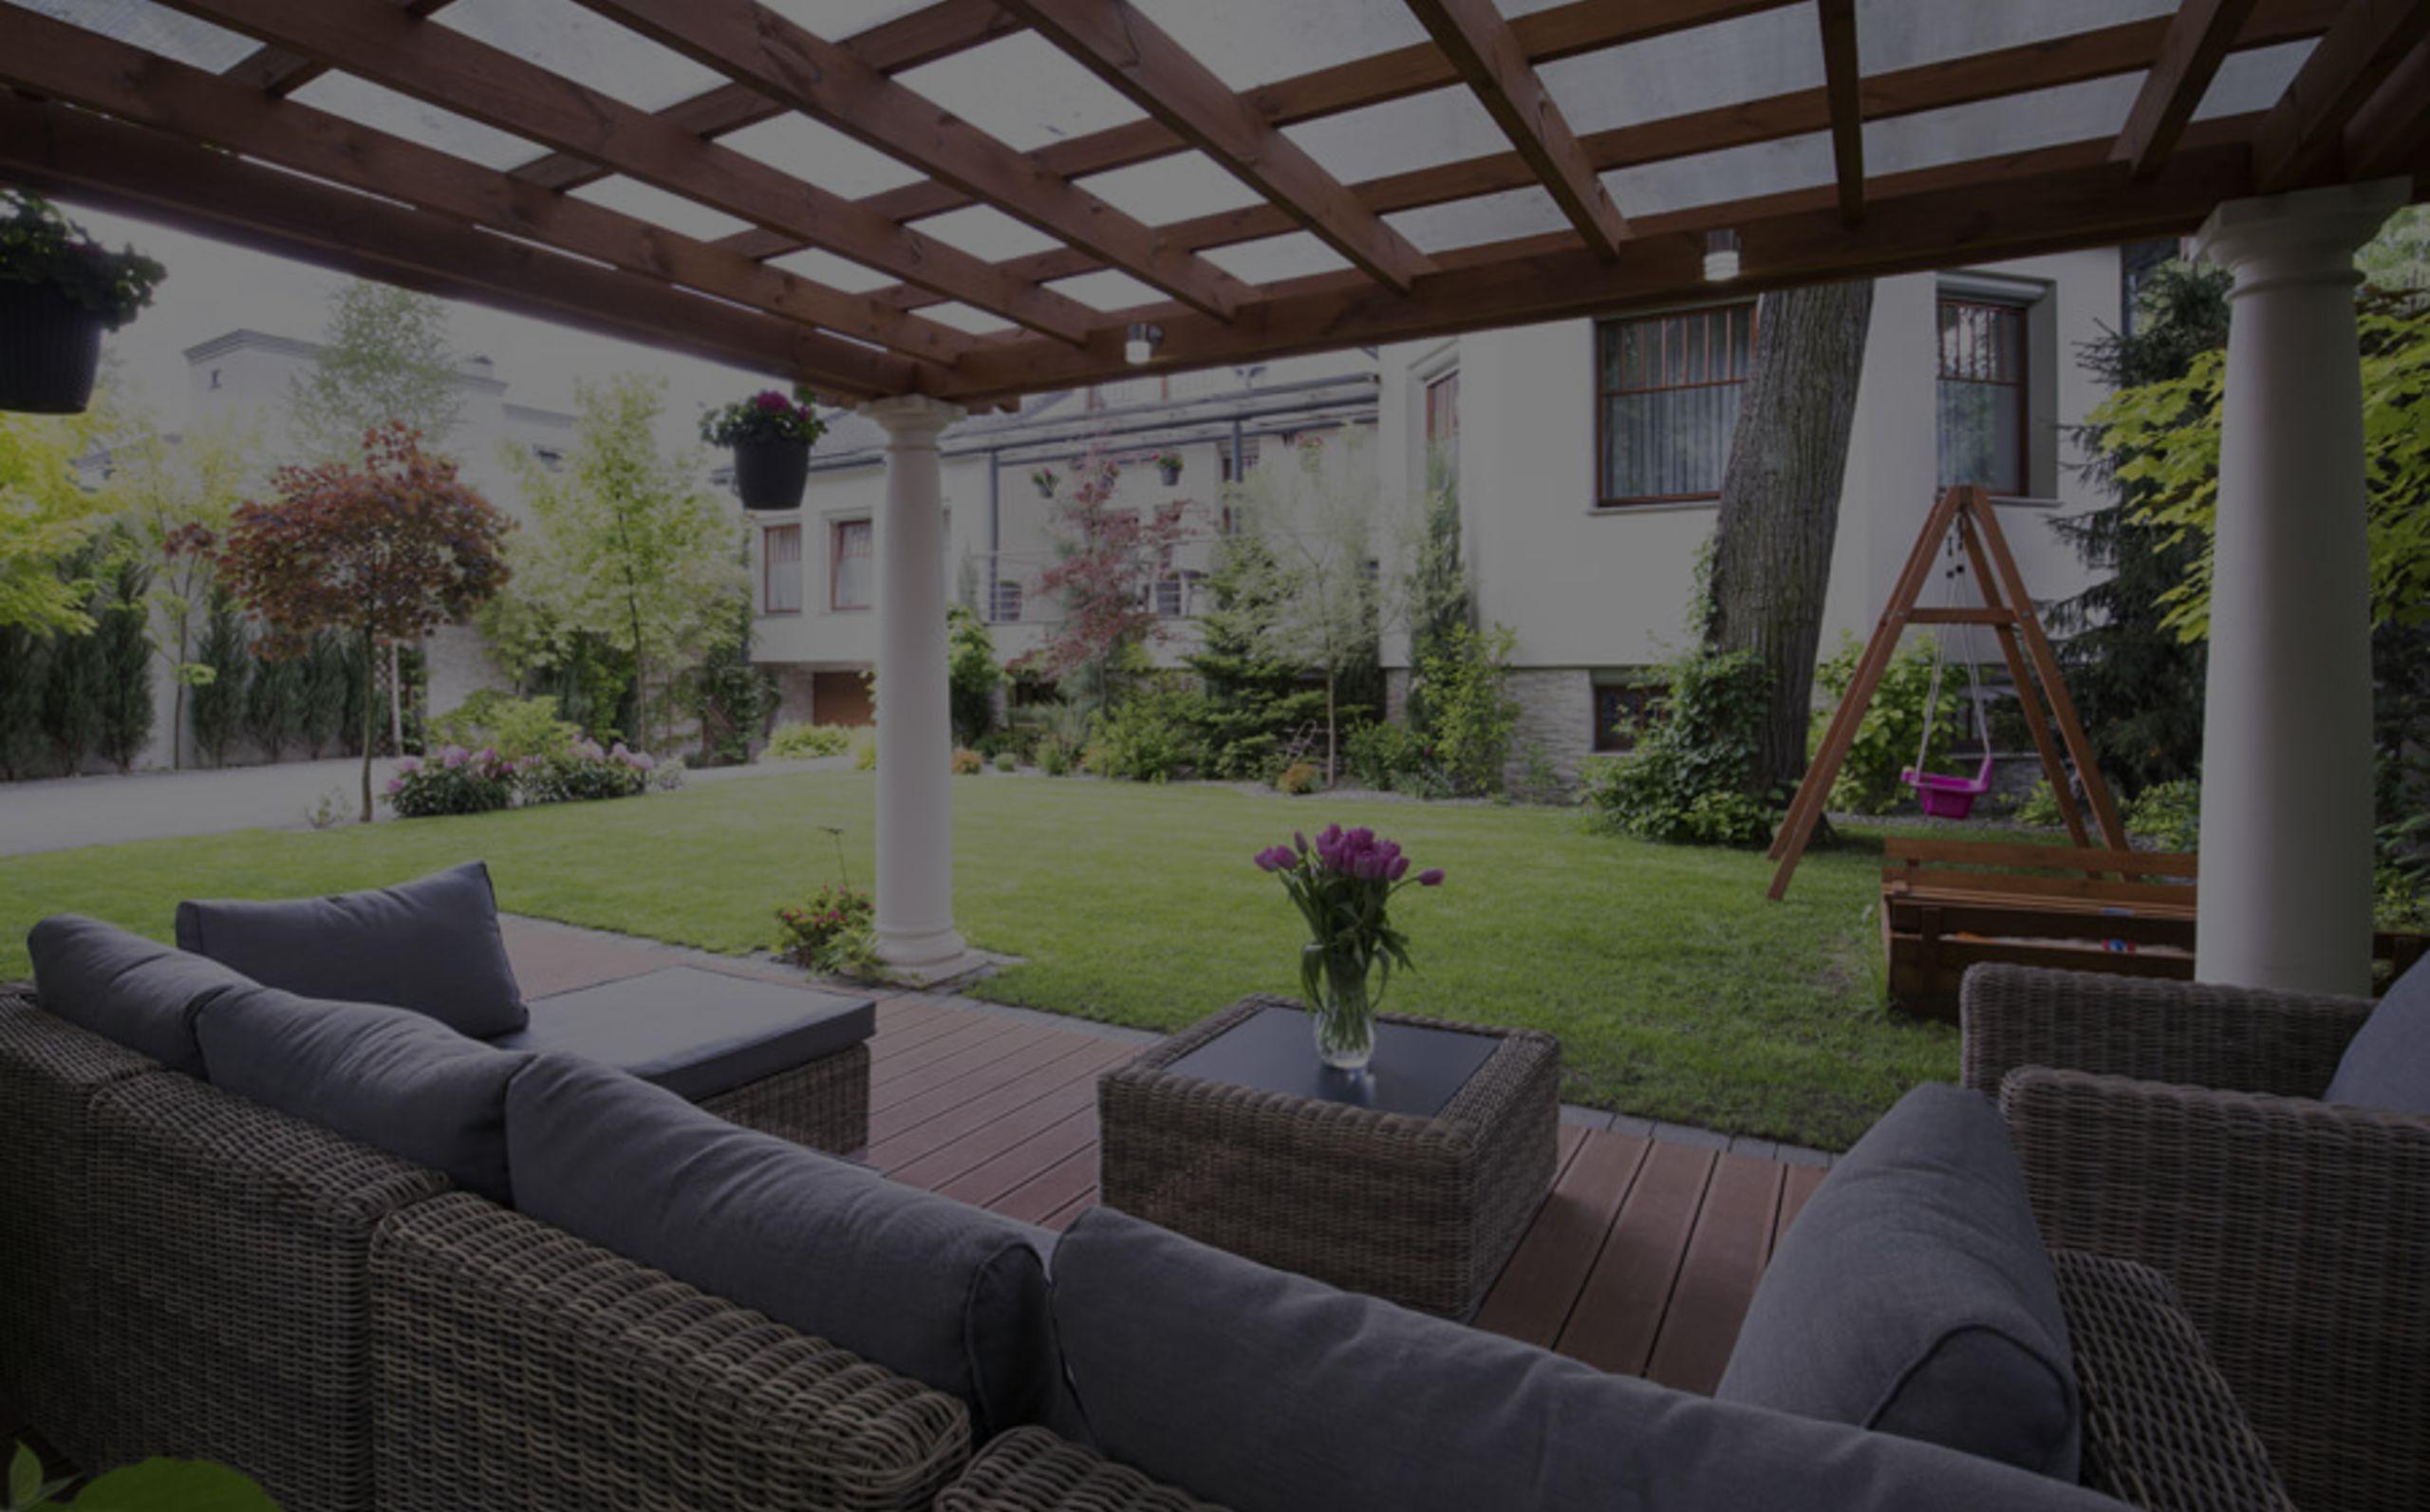 Relaxing outdoor spaces